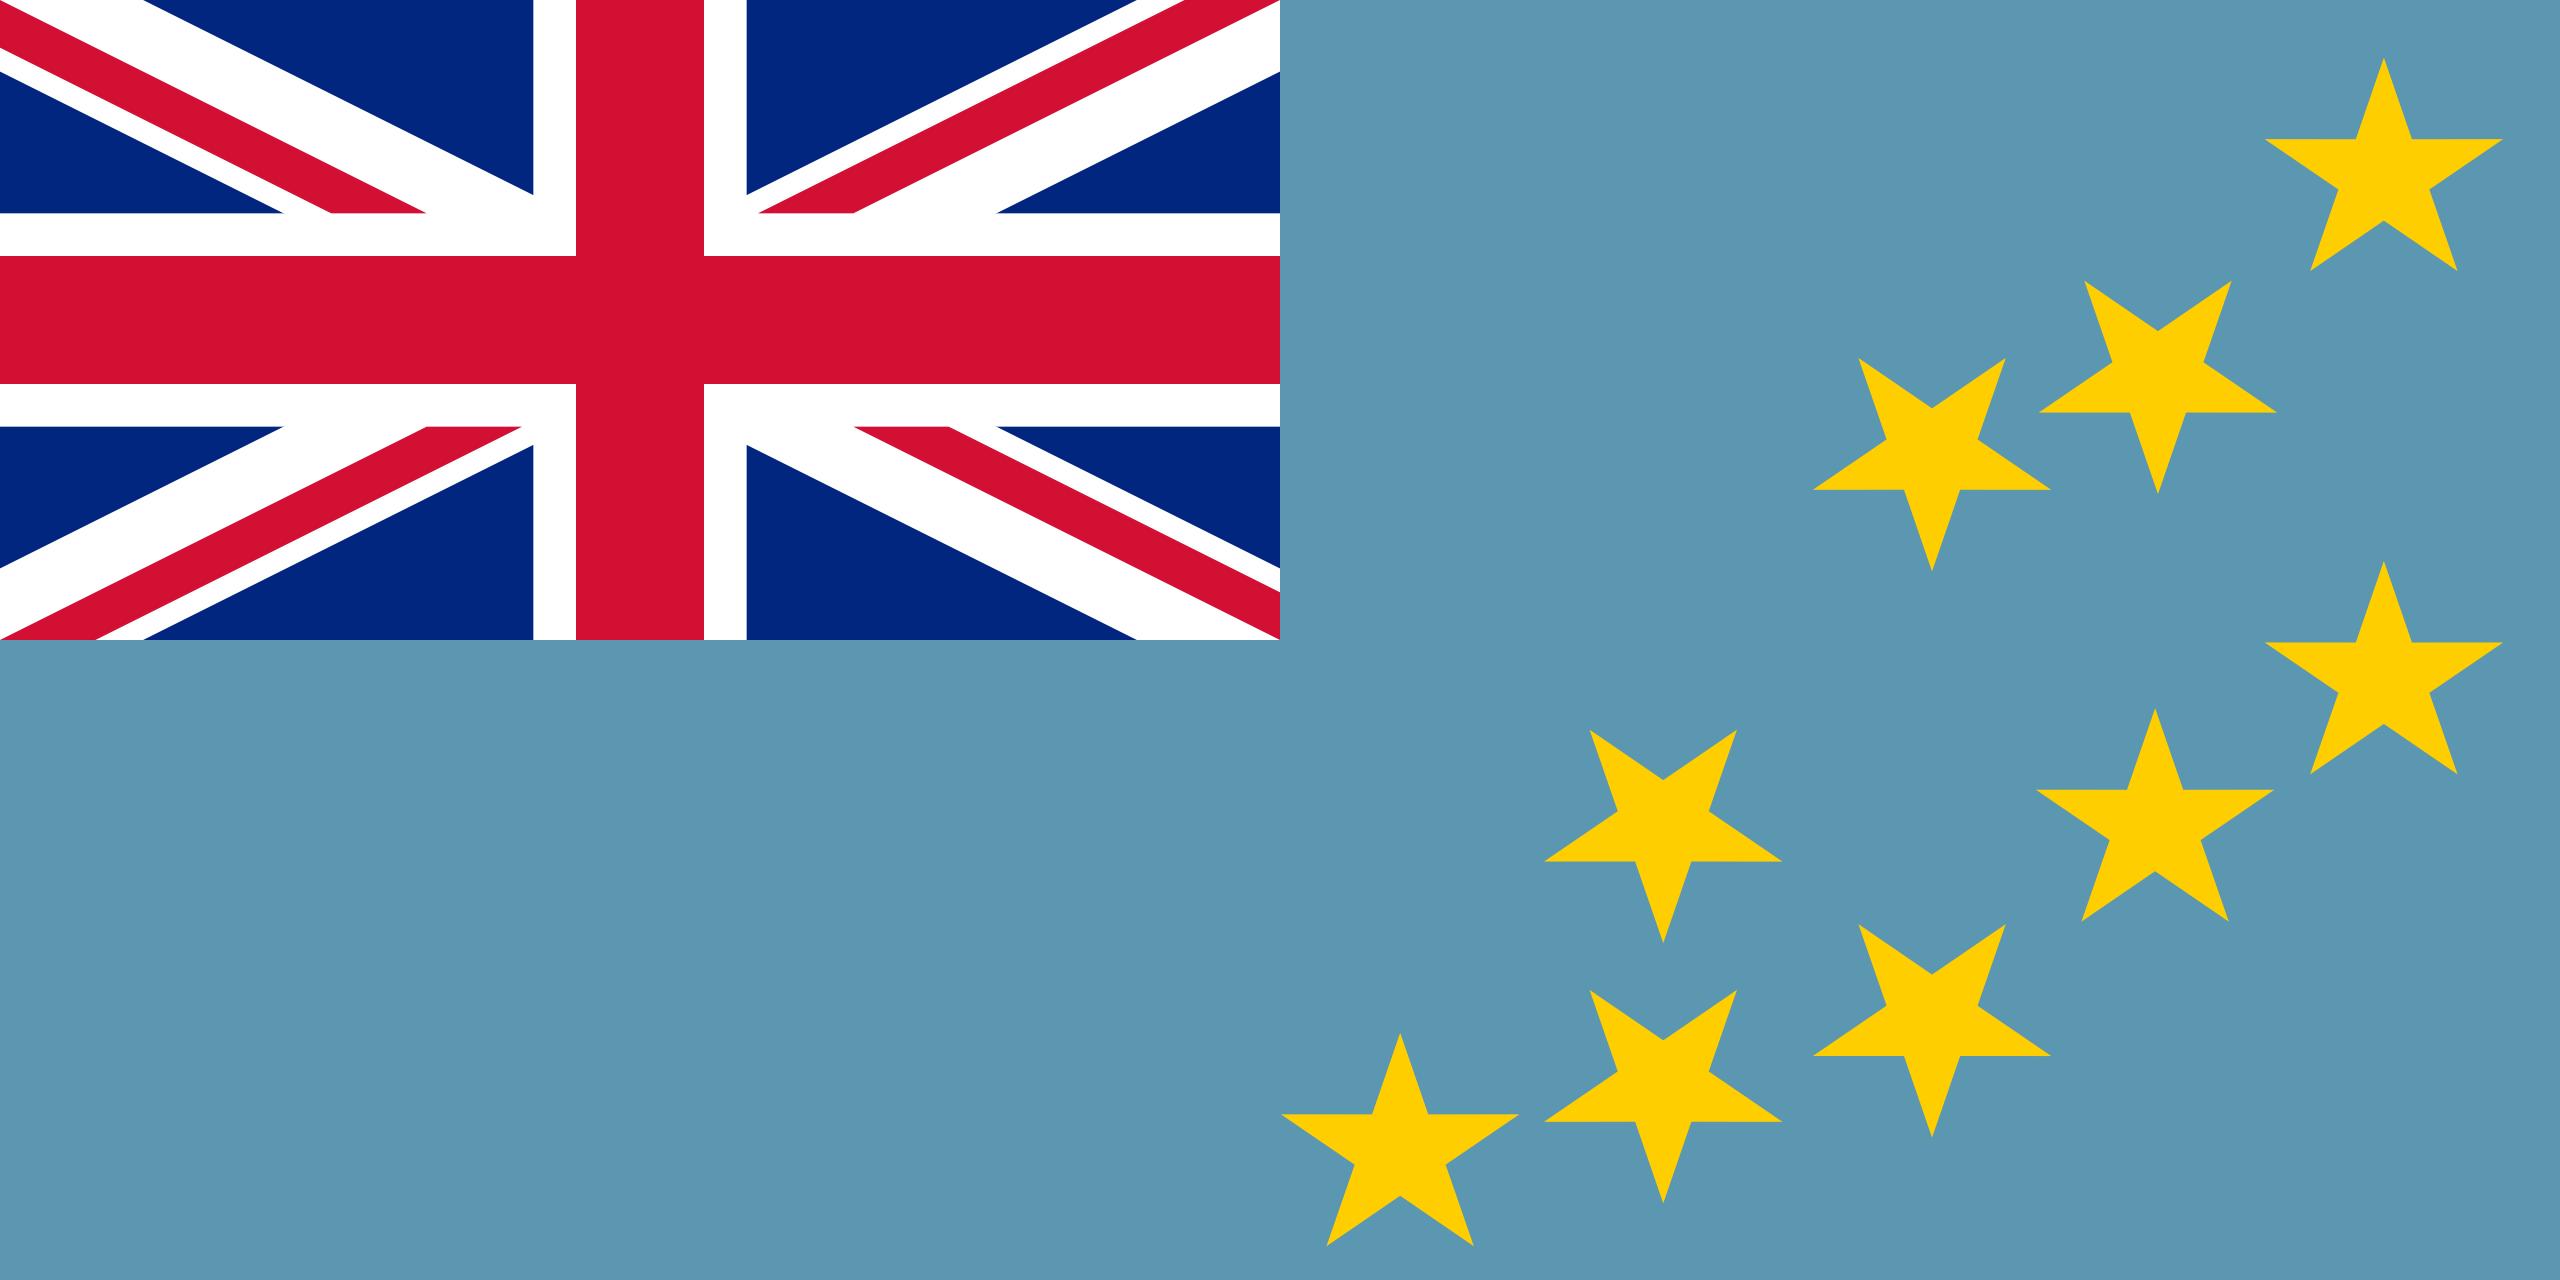 tuvalu, país, emblema, insignia, シンボル - HD の壁紙 - 教授-falken.com